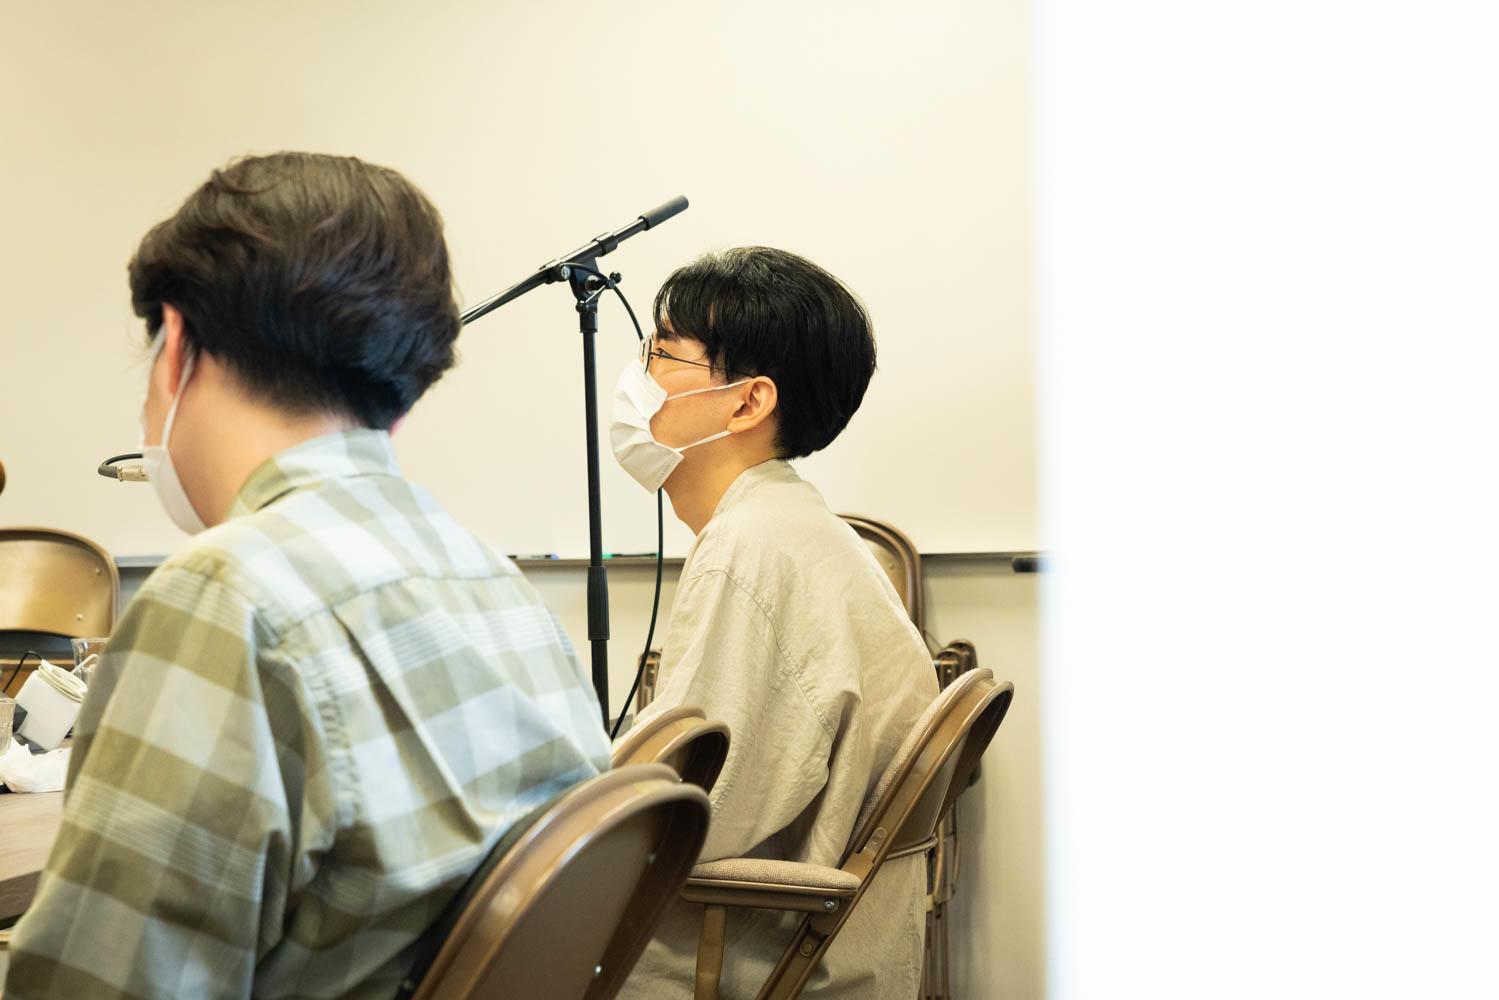 odol ミゾベ・森山がゲスト出演!FM福岡「Curated Hour ~FRIENDSHIP. RADIO」-2021.06.09-